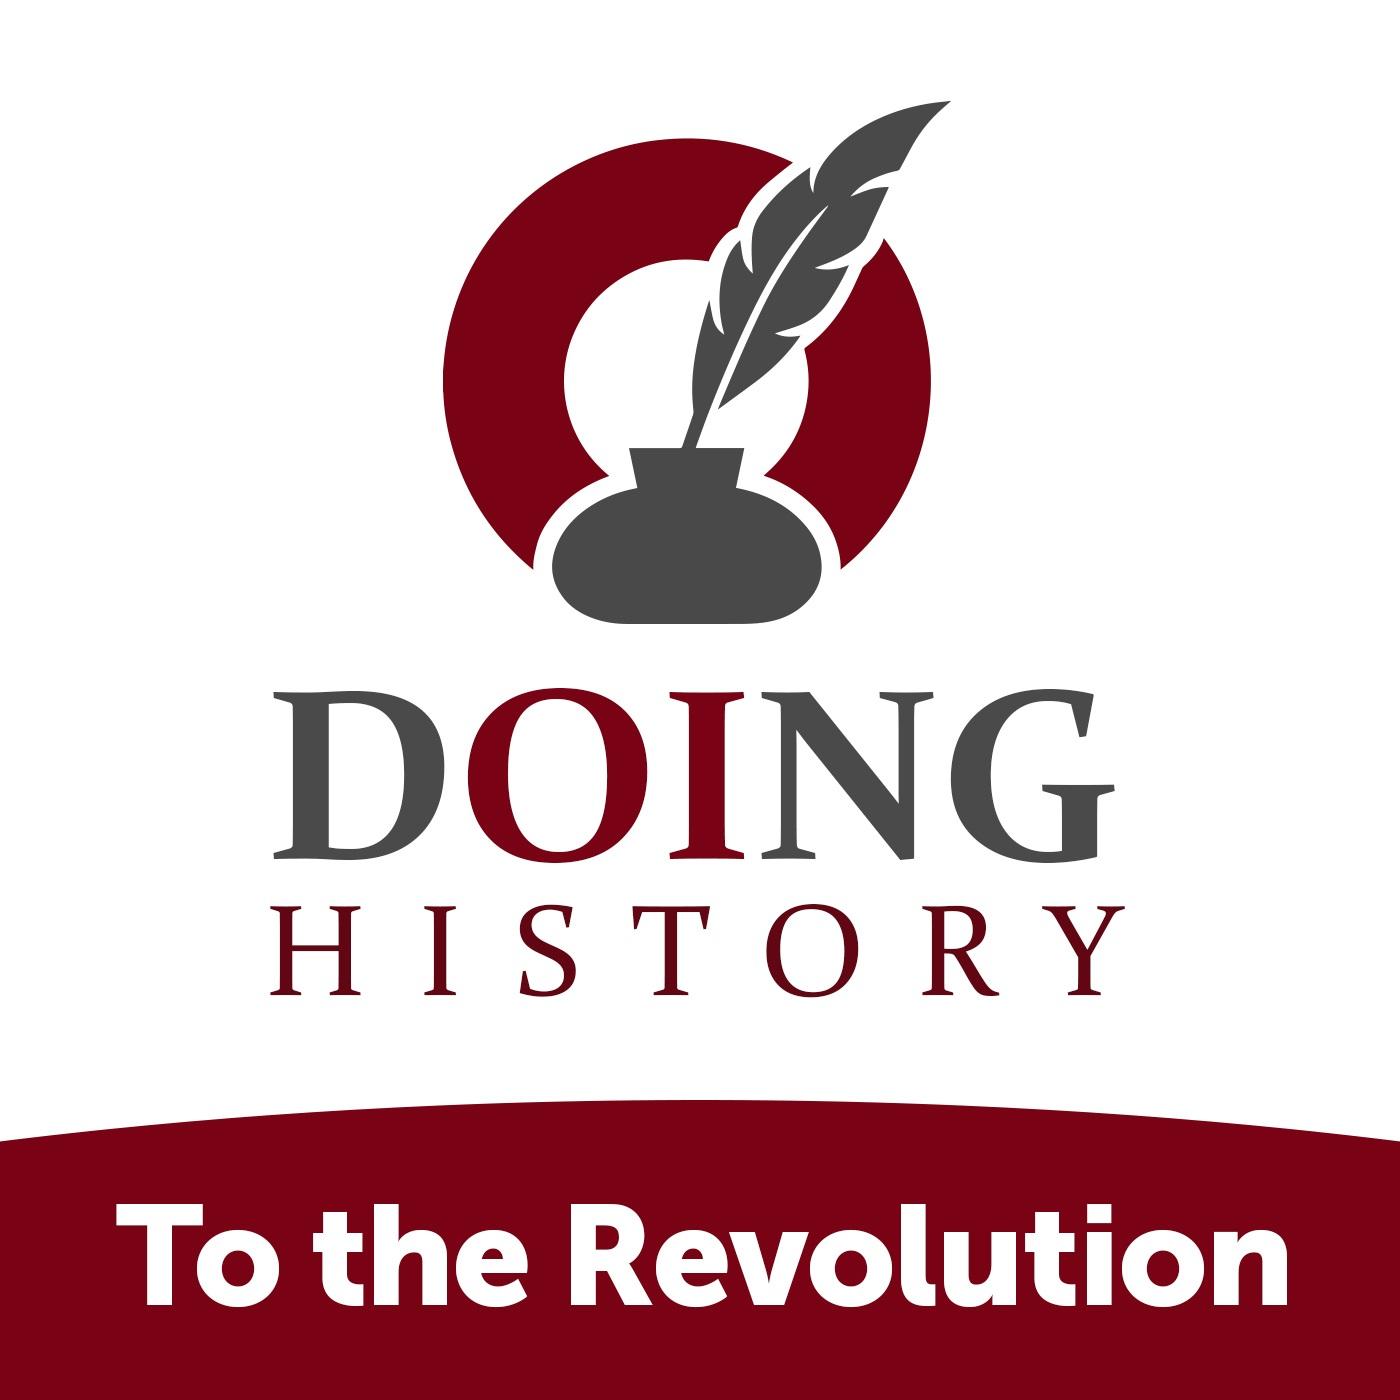 Episode 163: The American Revolution in North America - Ben